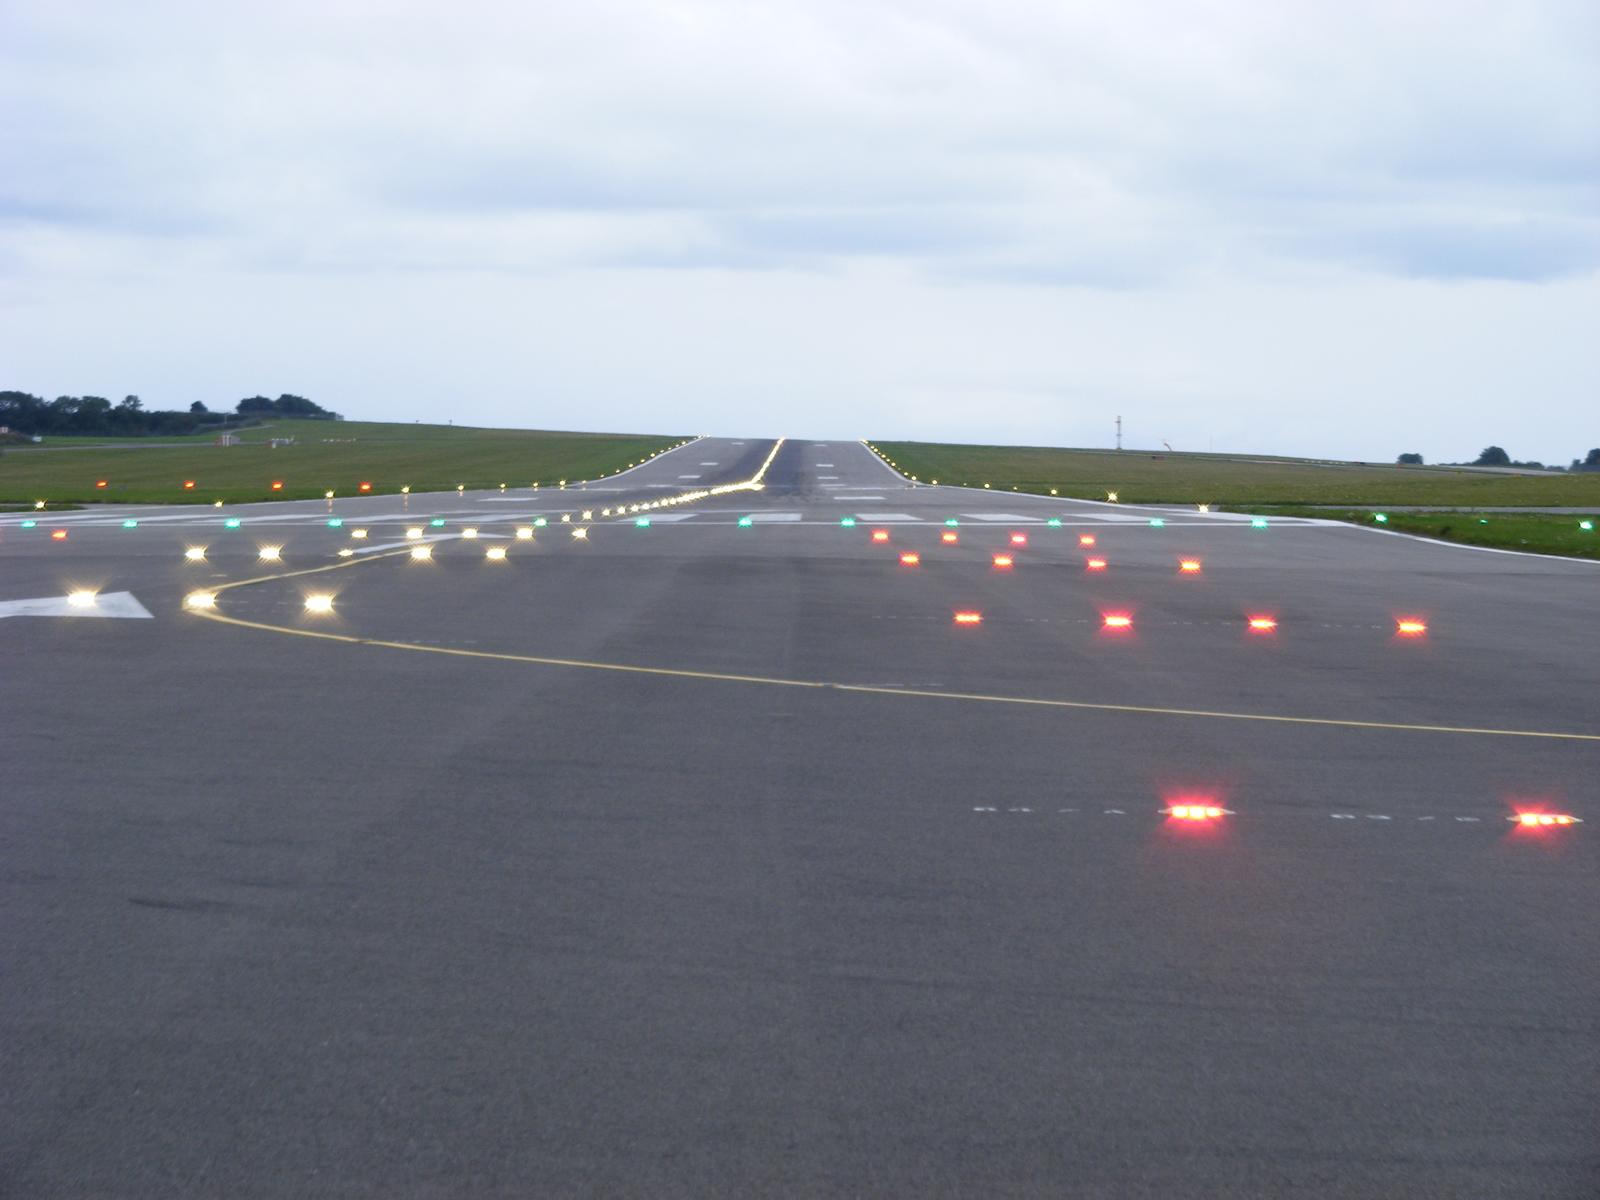 Runway Lights Bandara Adisutjipto Padam, Bandara Closed